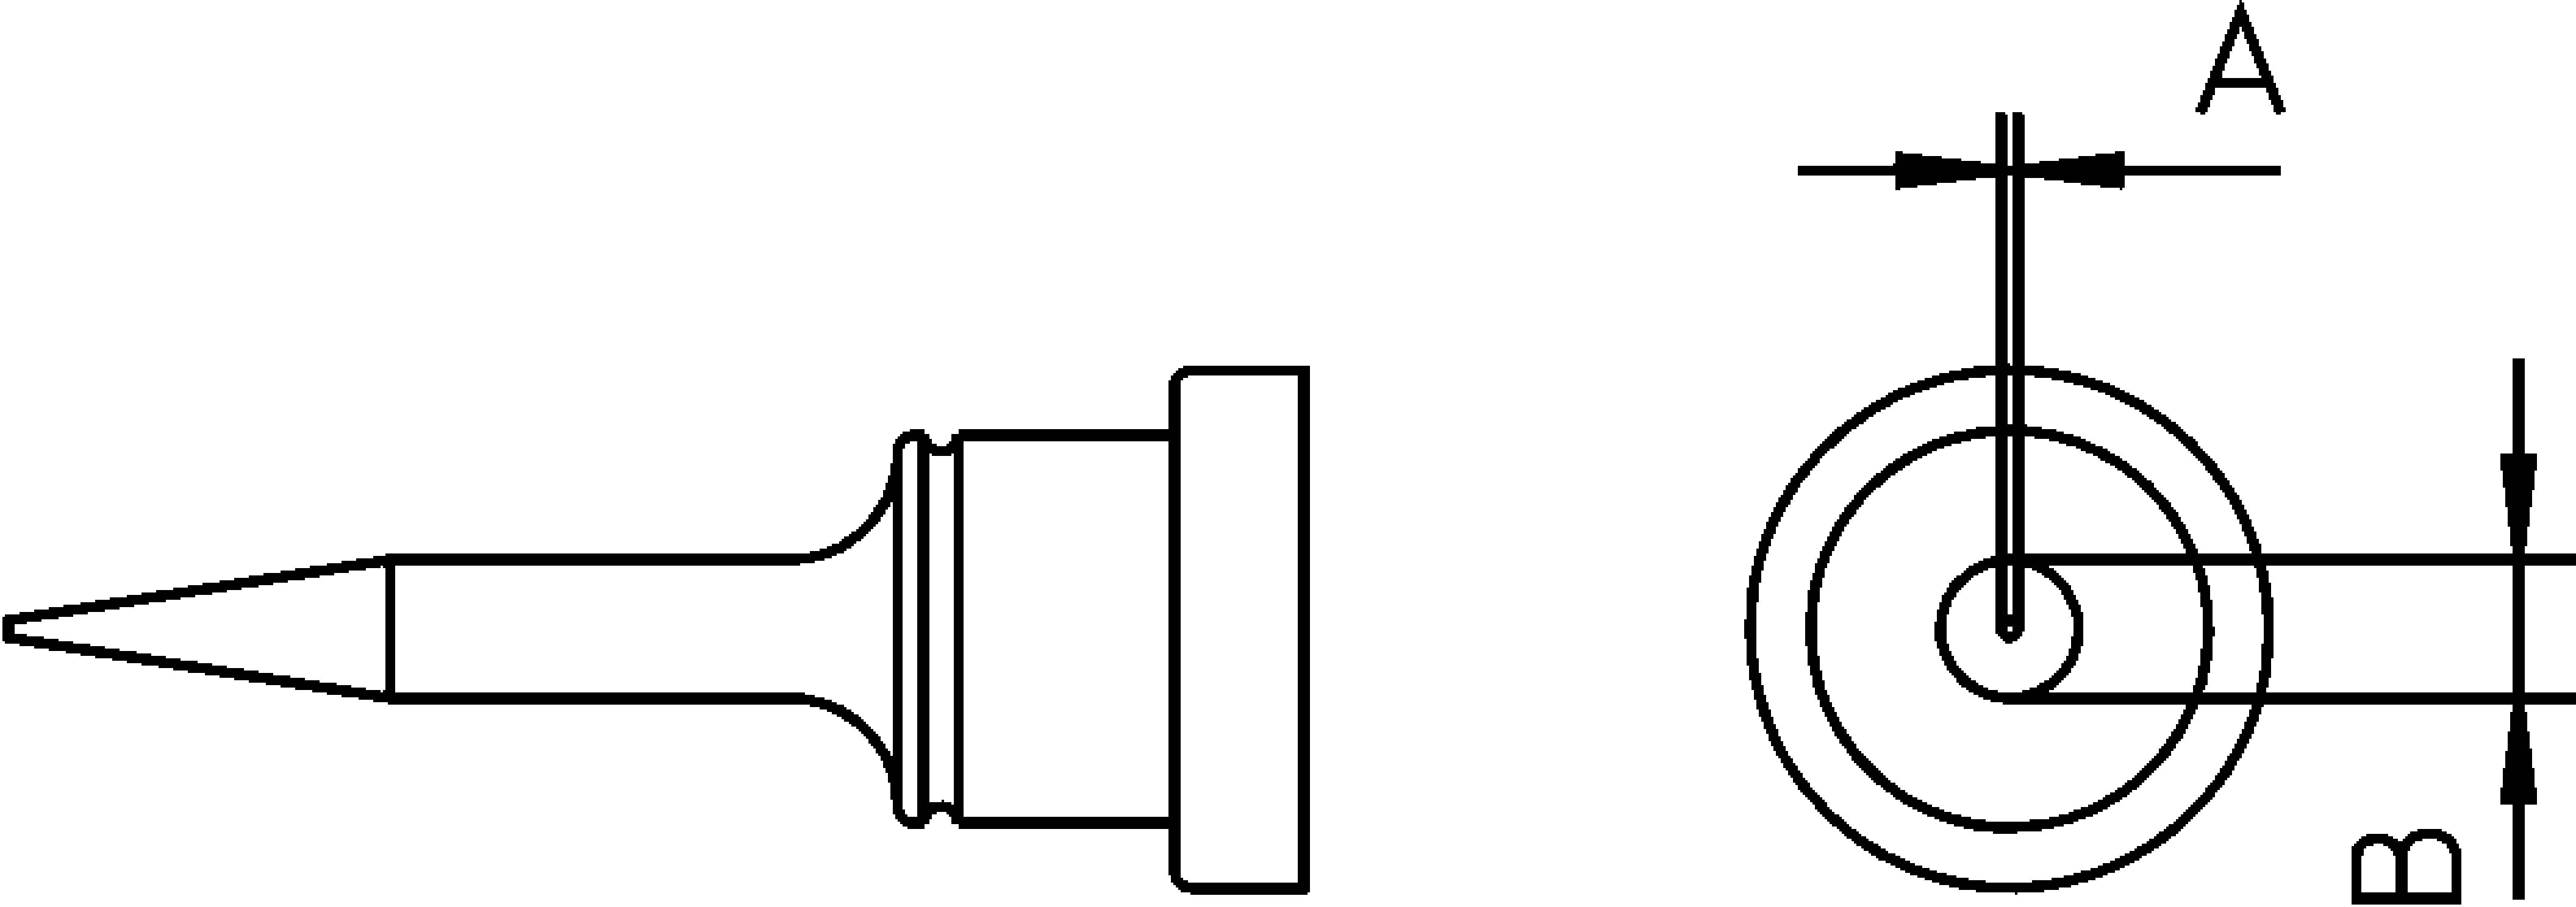 Spájkovací hrot okrúhla forma, dlhá Weller Professional LT-1S, velikost hrotu 0.2 mm, 1 ks